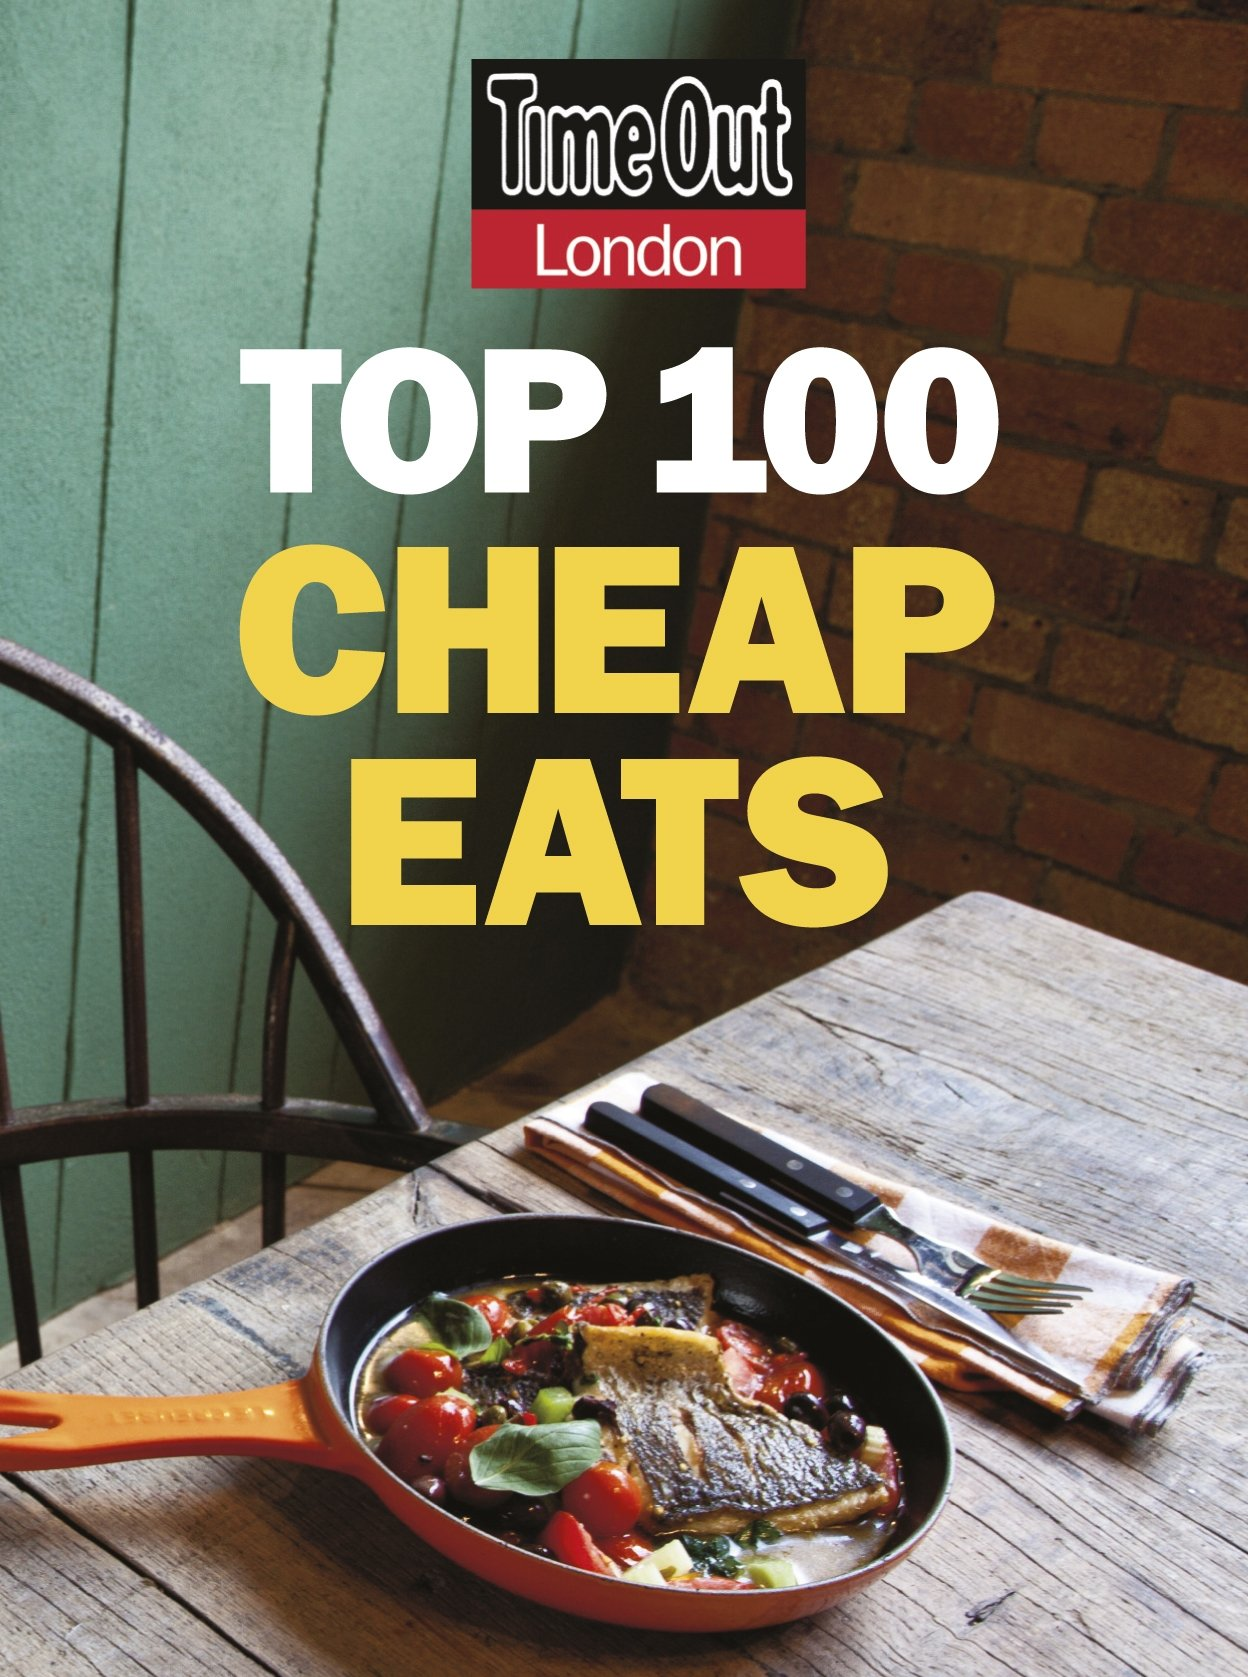 Time Out London Top 100 Cheap Eats (Time Out Cheap Eats)